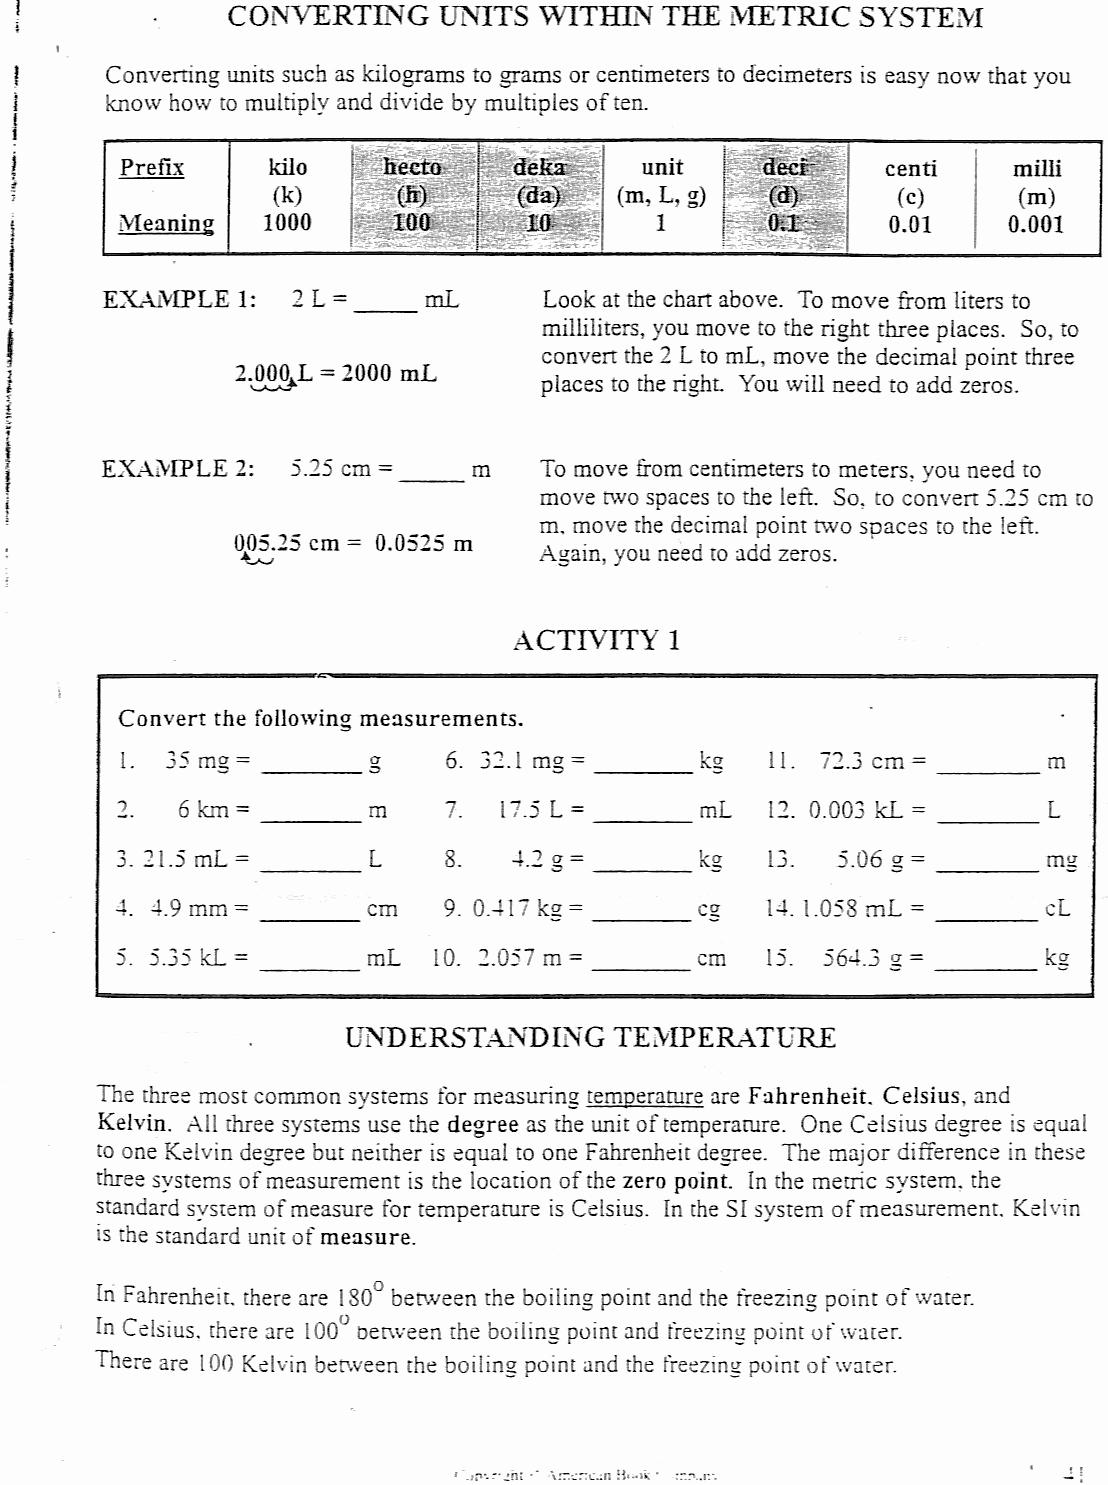 Science Measurement Worksheets Inspirational Science Measuring Worksheets for Middle School Science